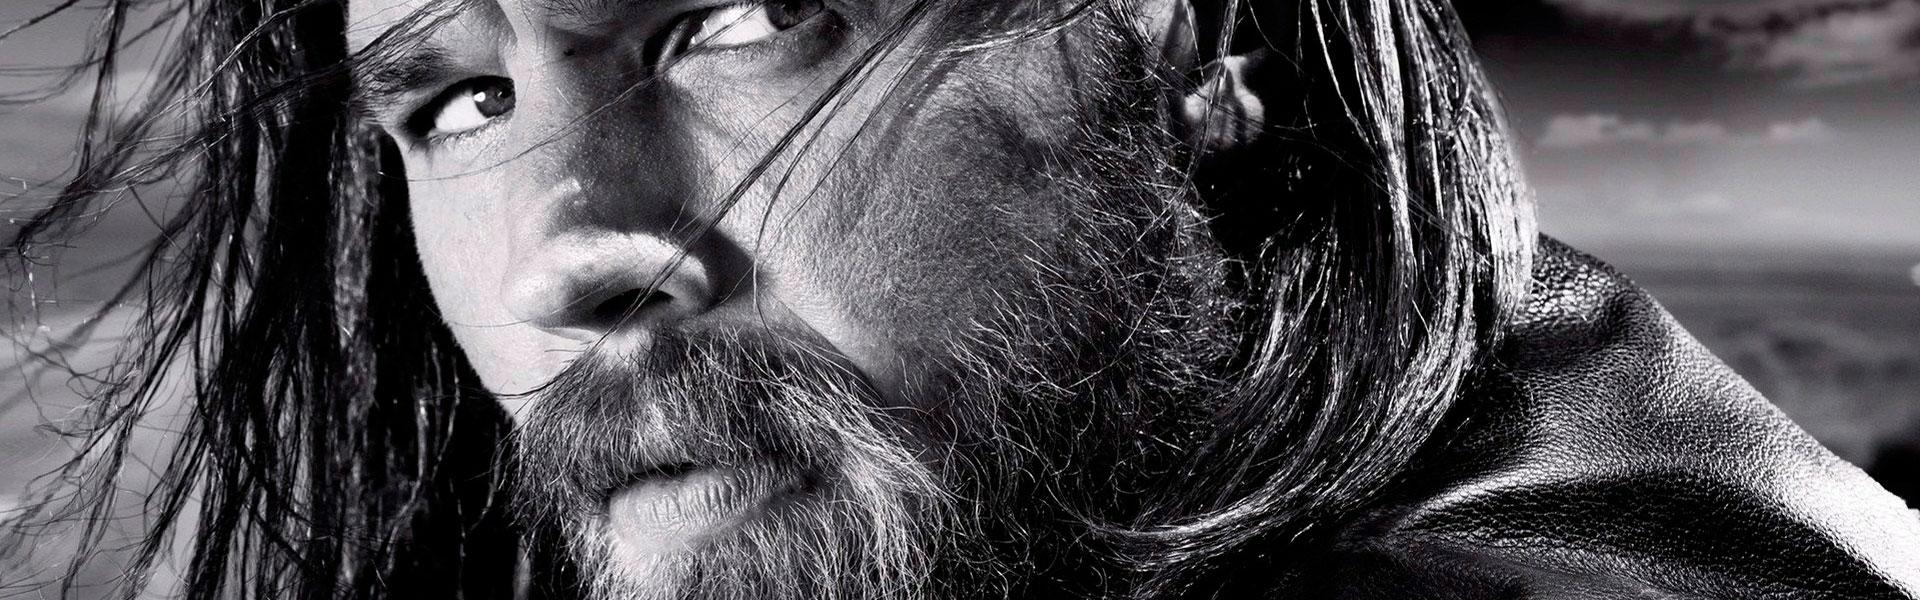 Ragnarr Beard 2017